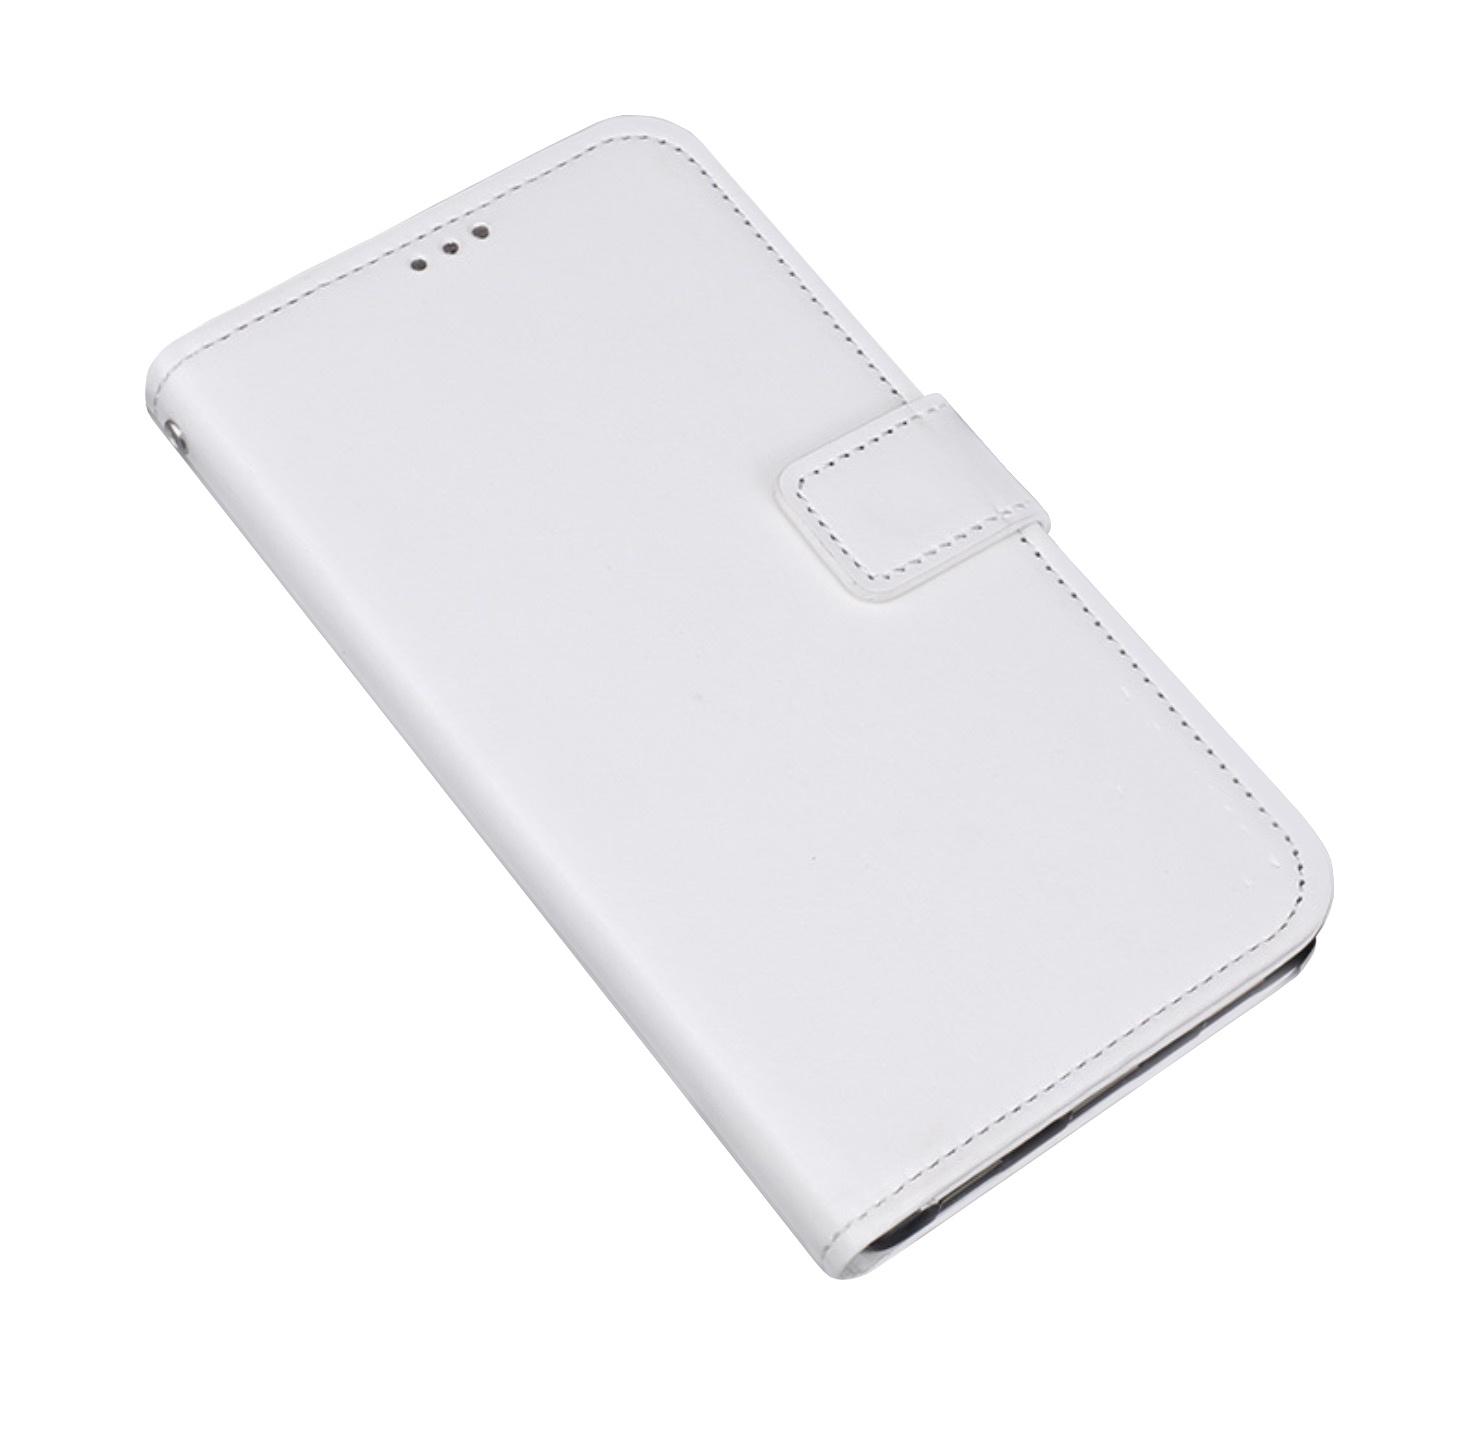 Чехол-книжка MyPads для HTC U Ultra с мульти-подставкой застёжкой и визитницей белый аксессуар чехол для htc u ultra brosco silicone black htc uu tpu black